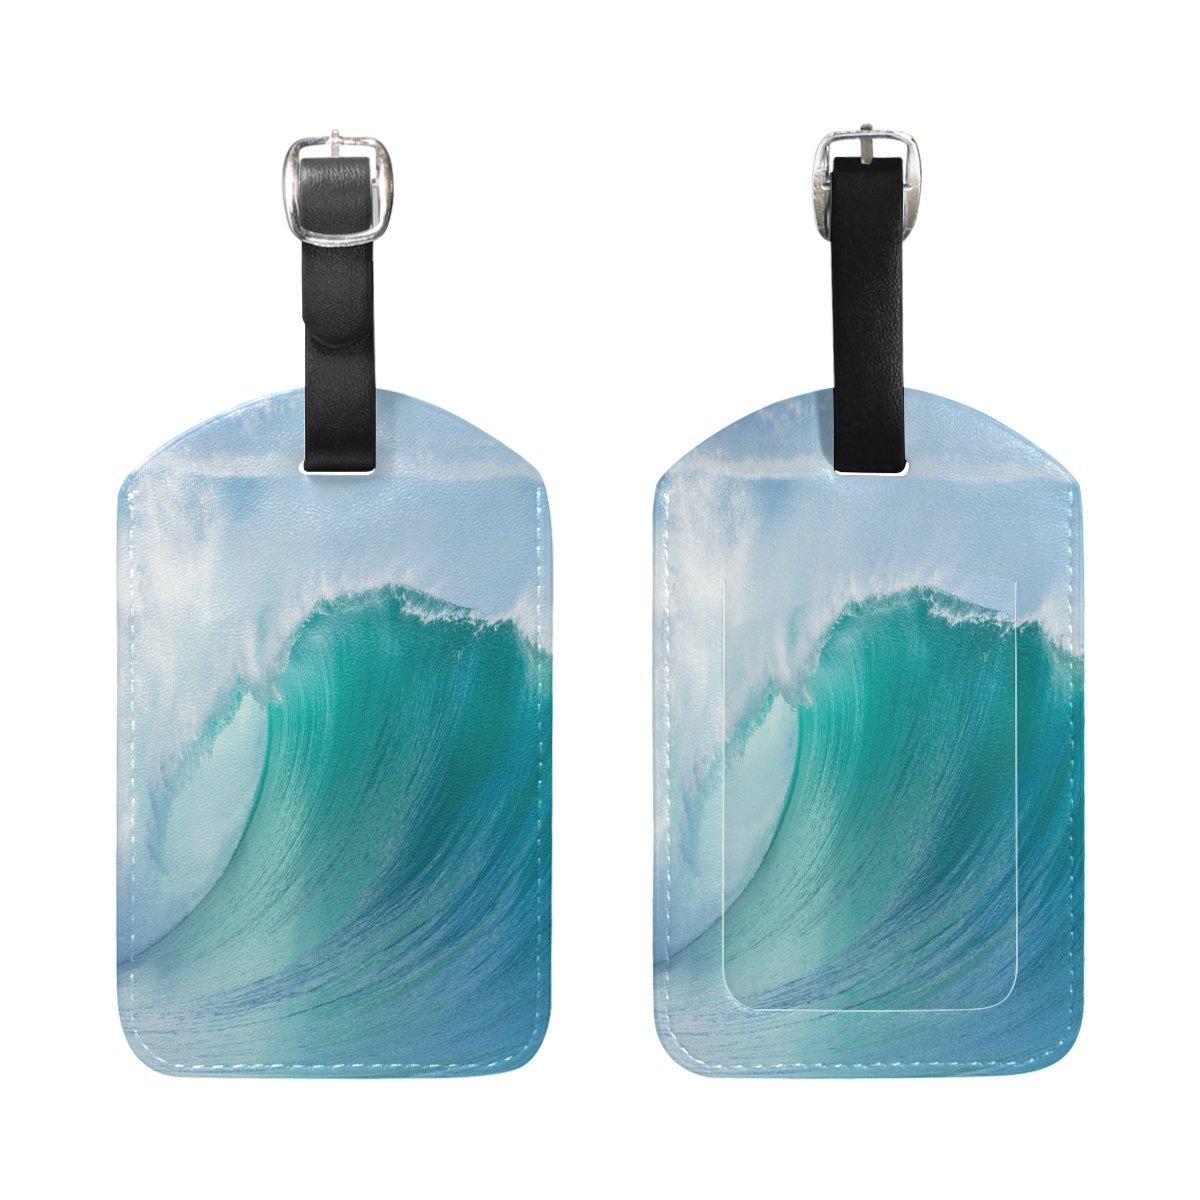 1Pcs Saobao Travel Luggage Tag Ocean Wave Hollow Crashing Curling Breaking Sea PU Leather Baggage Suitcase Travel ID Bag Tag